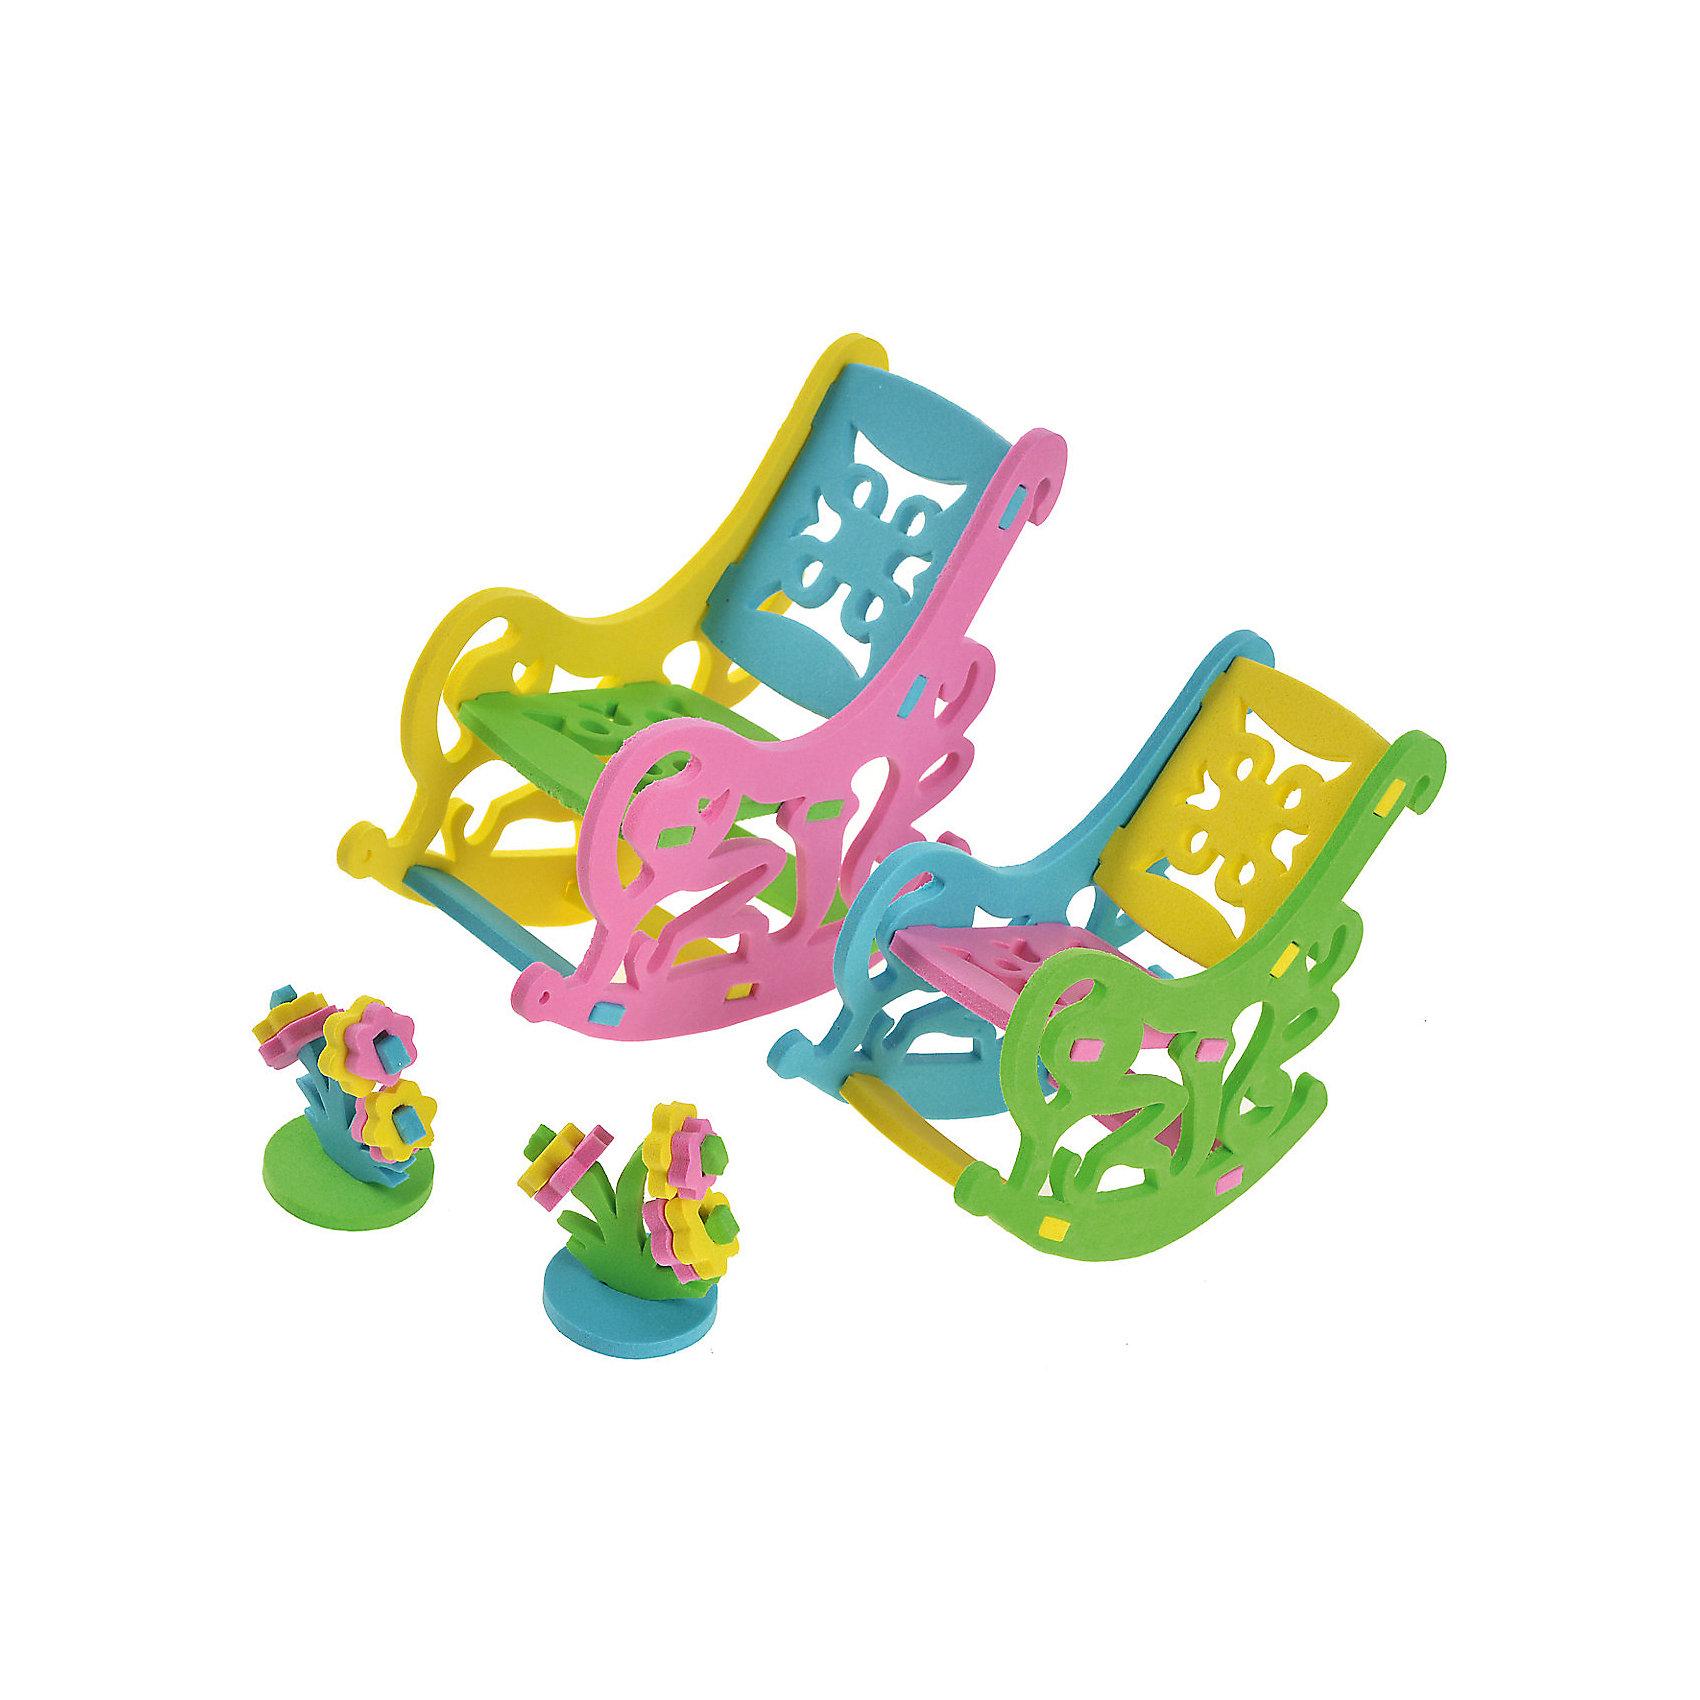 Мягкий 3D-пазл МебельМягкий 3Д пазл Мебель, 21х15 см., 5 дизайнов в ассортименте<br><br>Ширина мм: 9999<br>Глубина мм: 9999<br>Высота мм: 9999<br>Вес г: 9999<br>Возраст от месяцев: 36<br>Возраст до месяцев: 84<br>Пол: Унисекс<br>Возраст: Детский<br>SKU: 4889459